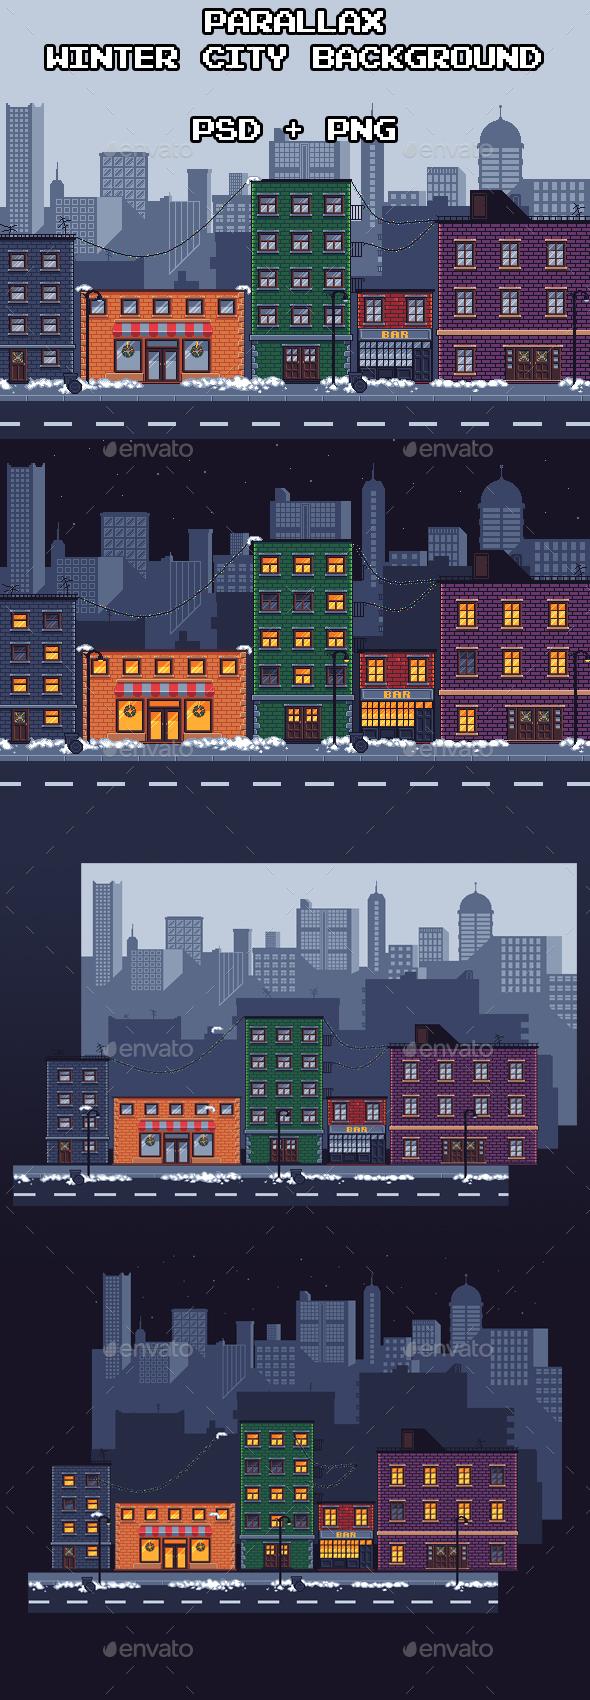 GraphicRiver Parallax Winter City Background 21137018